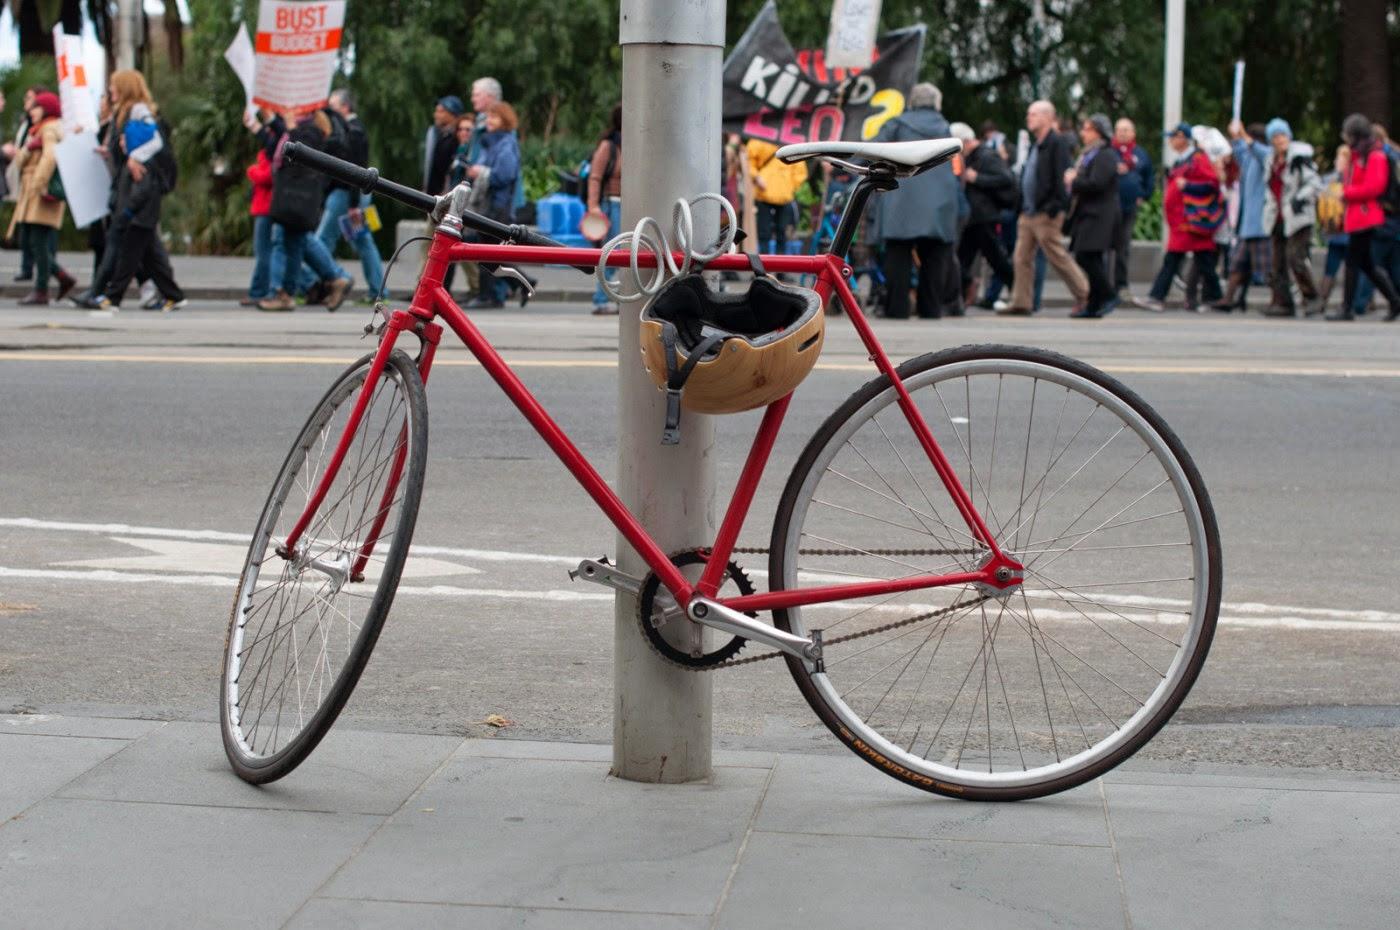 single speed, track frame, melbourne, australia, bicycle, bike, tim macauley, the biketorialist, vintage, lug, lugs, lugging